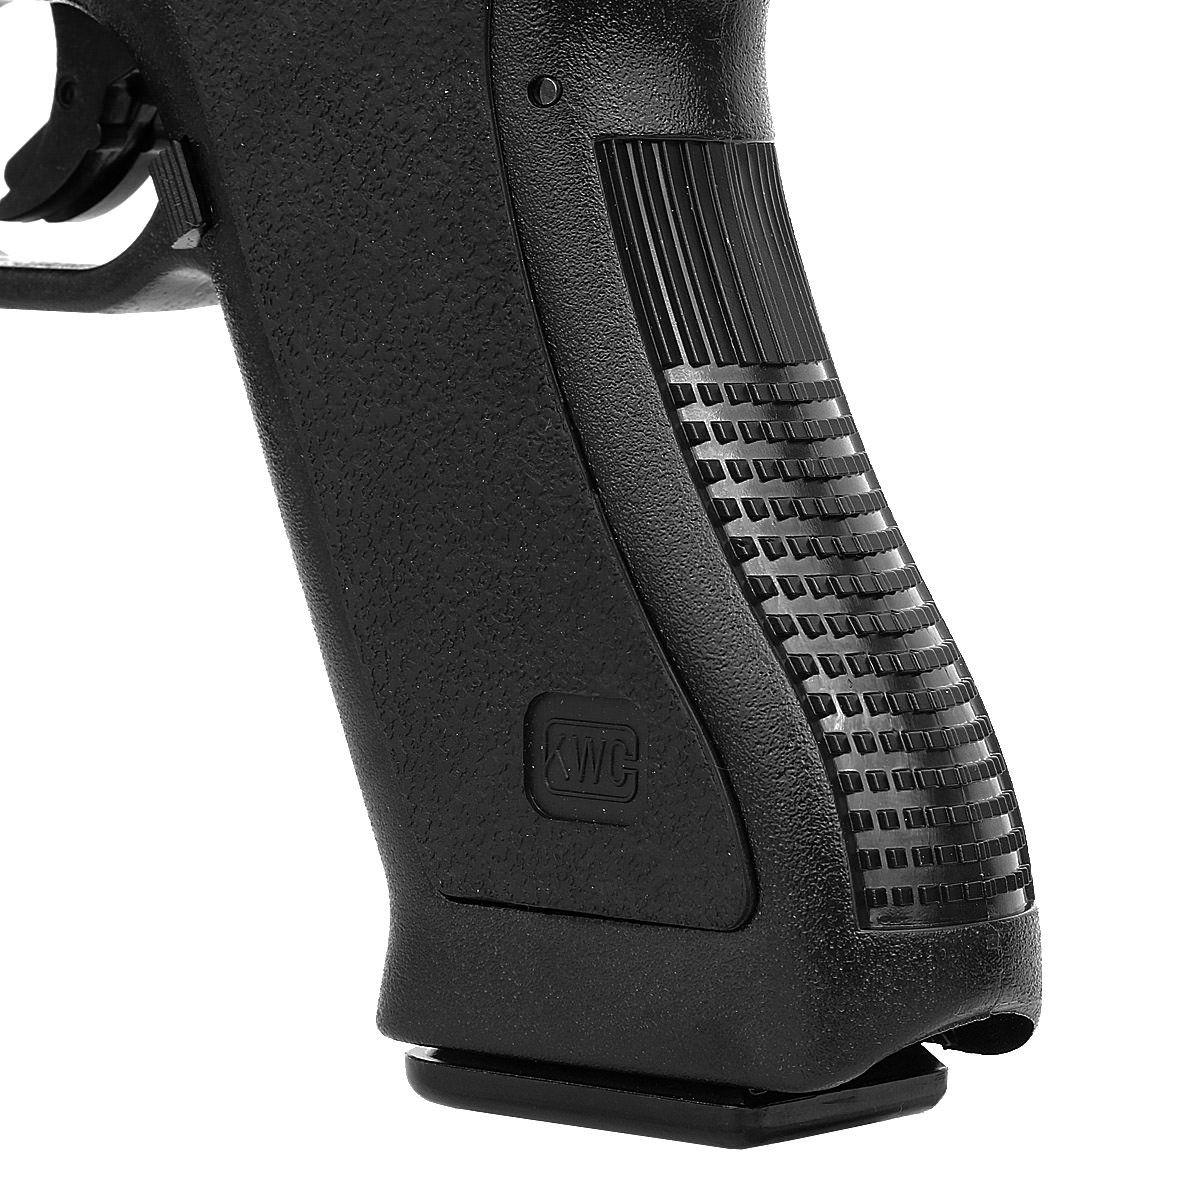 Pistola Airsoft Rossi KWC K17 Spring 6mm